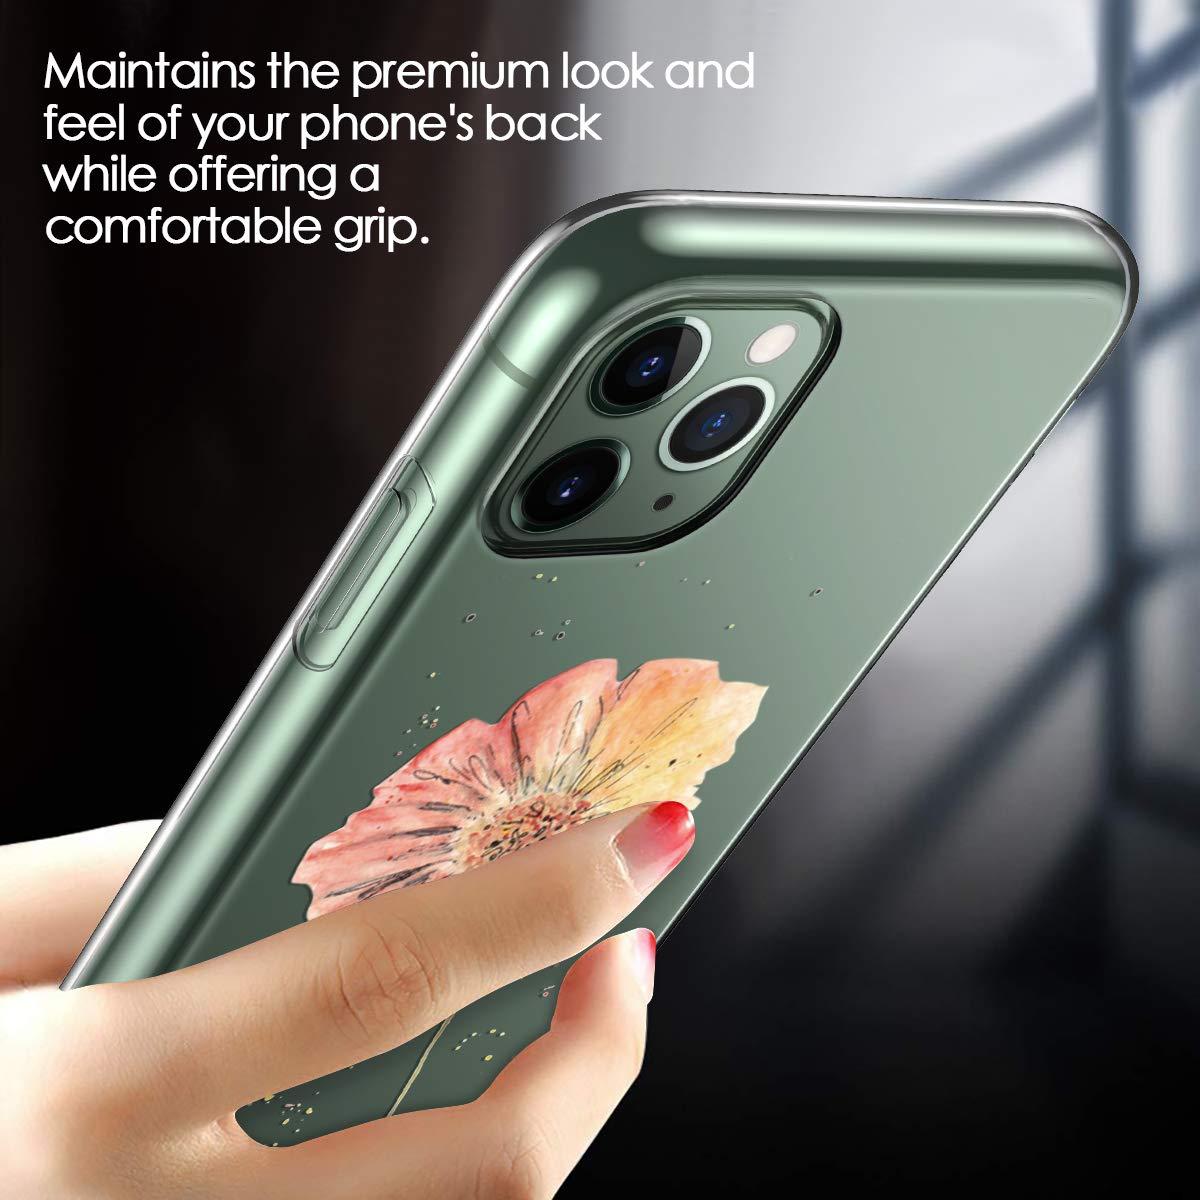 - Hirsch 3 Pack Yokata Kompatibel H/ülle iPhone 11 Pro Max Silikon Transparent Durchsichtig Handyh/ülle Schutzh/ülle TPU Ultra D/ünn Slim Kratzfest Handytasche Papierflieger Flamingo